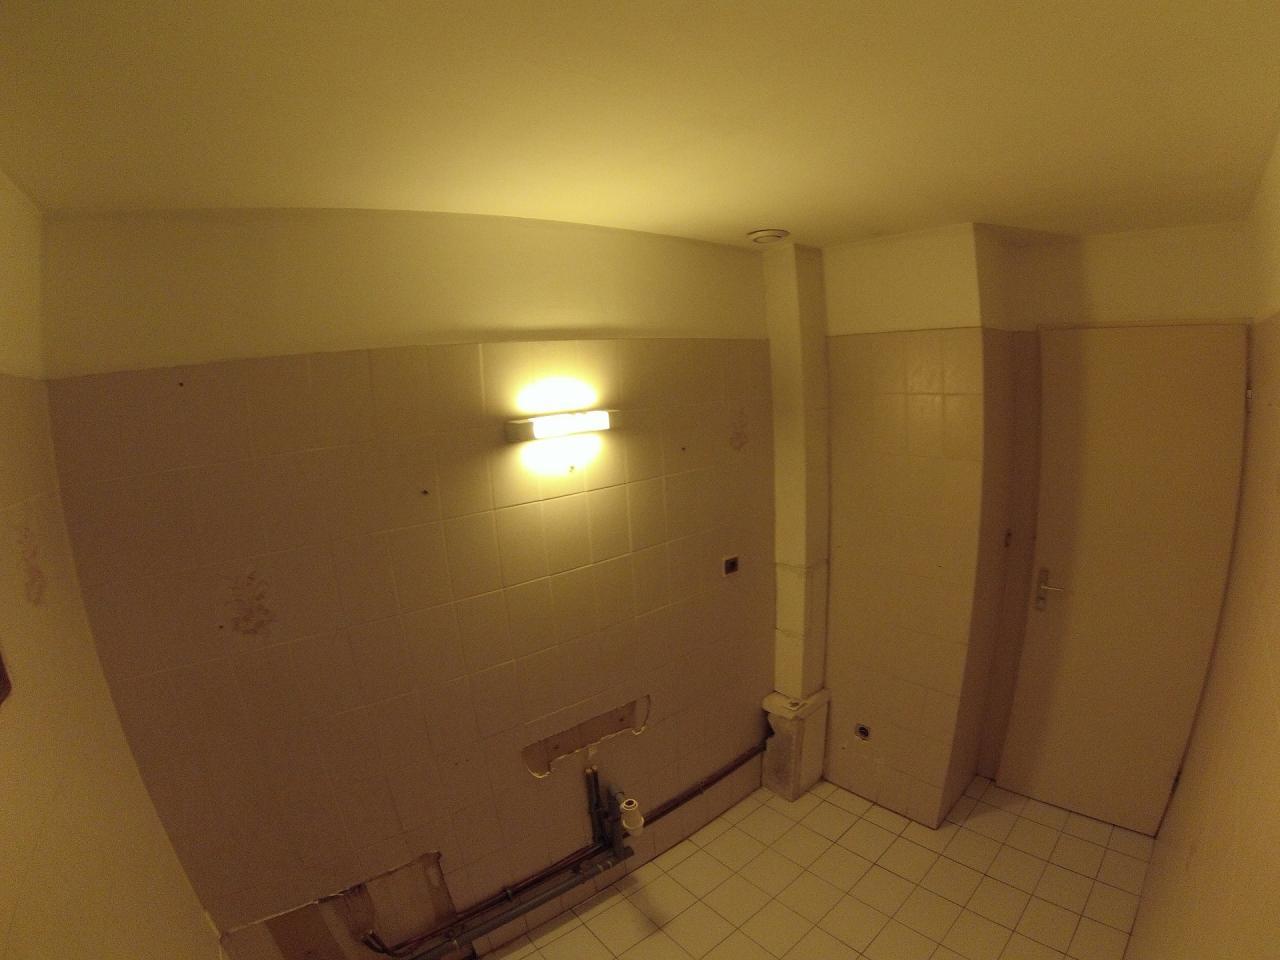 23 salle de bain en noir et blanc moderne. Black Bedroom Furniture Sets. Home Design Ideas